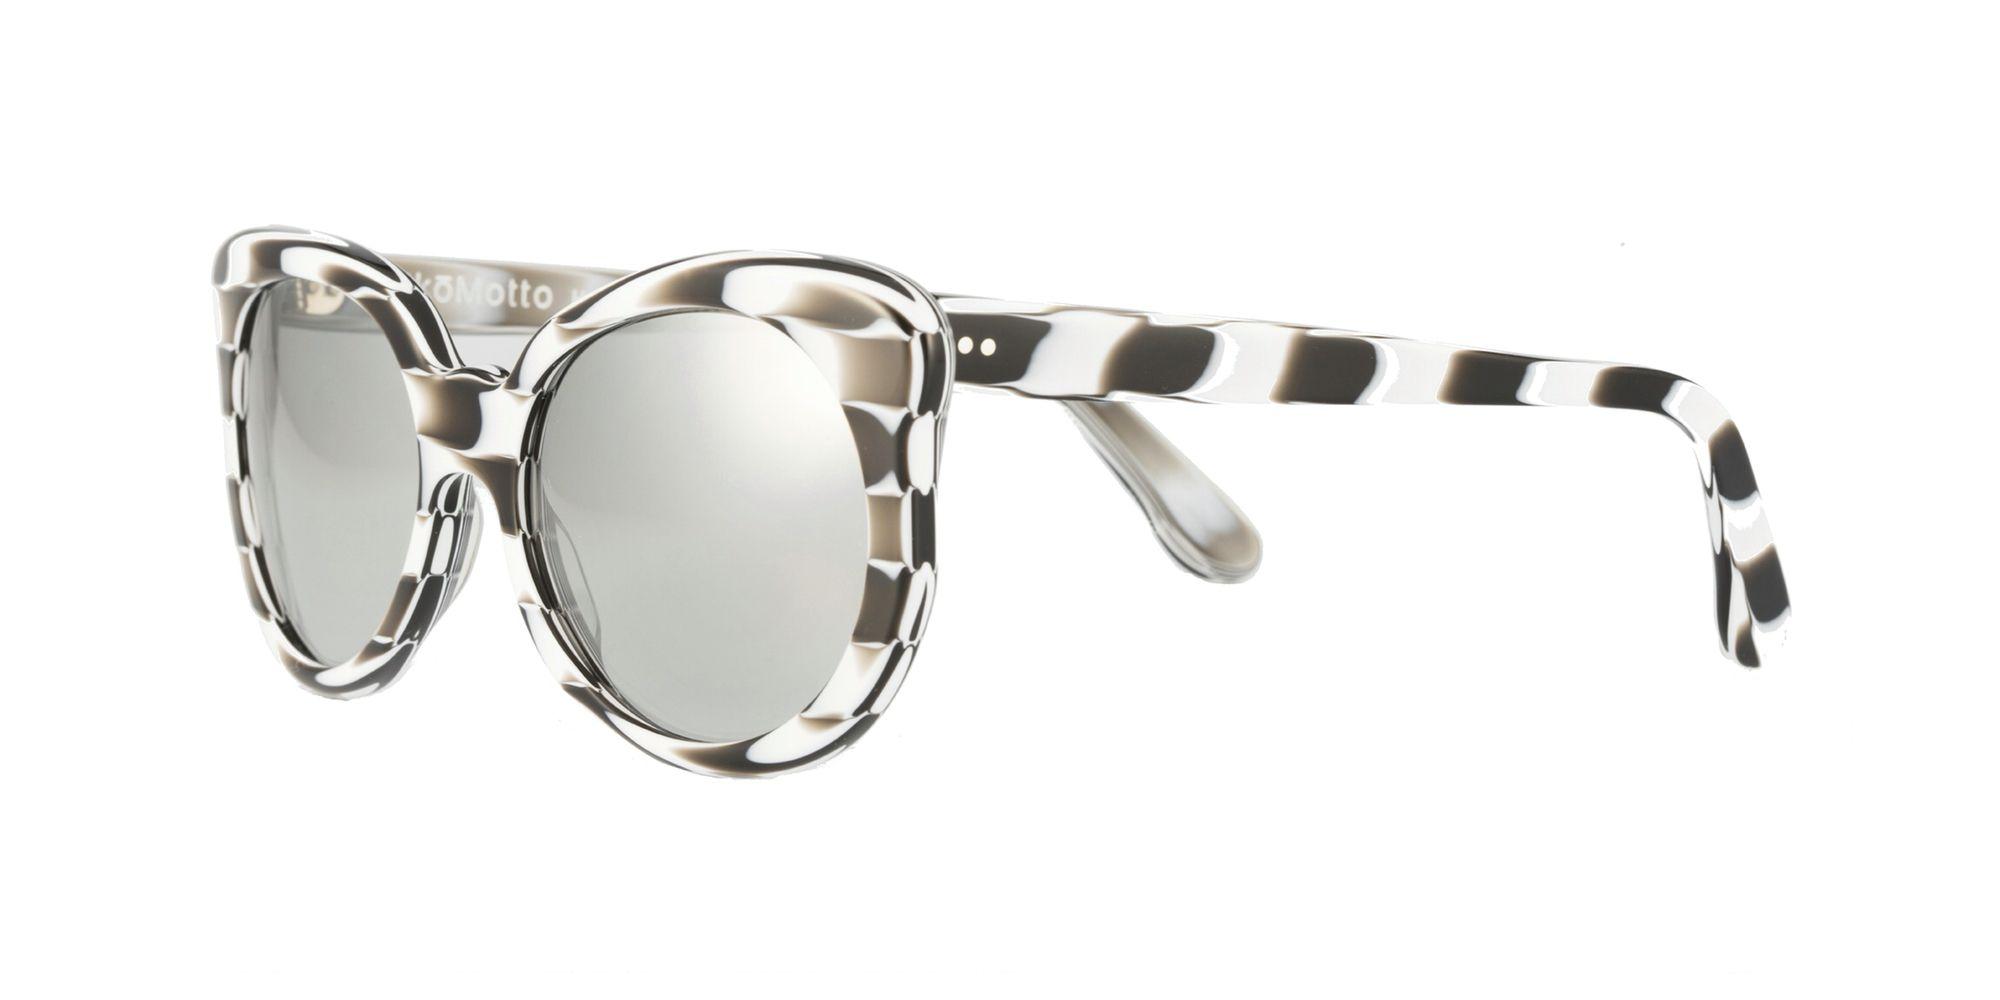 Dokomotto sunglasses!